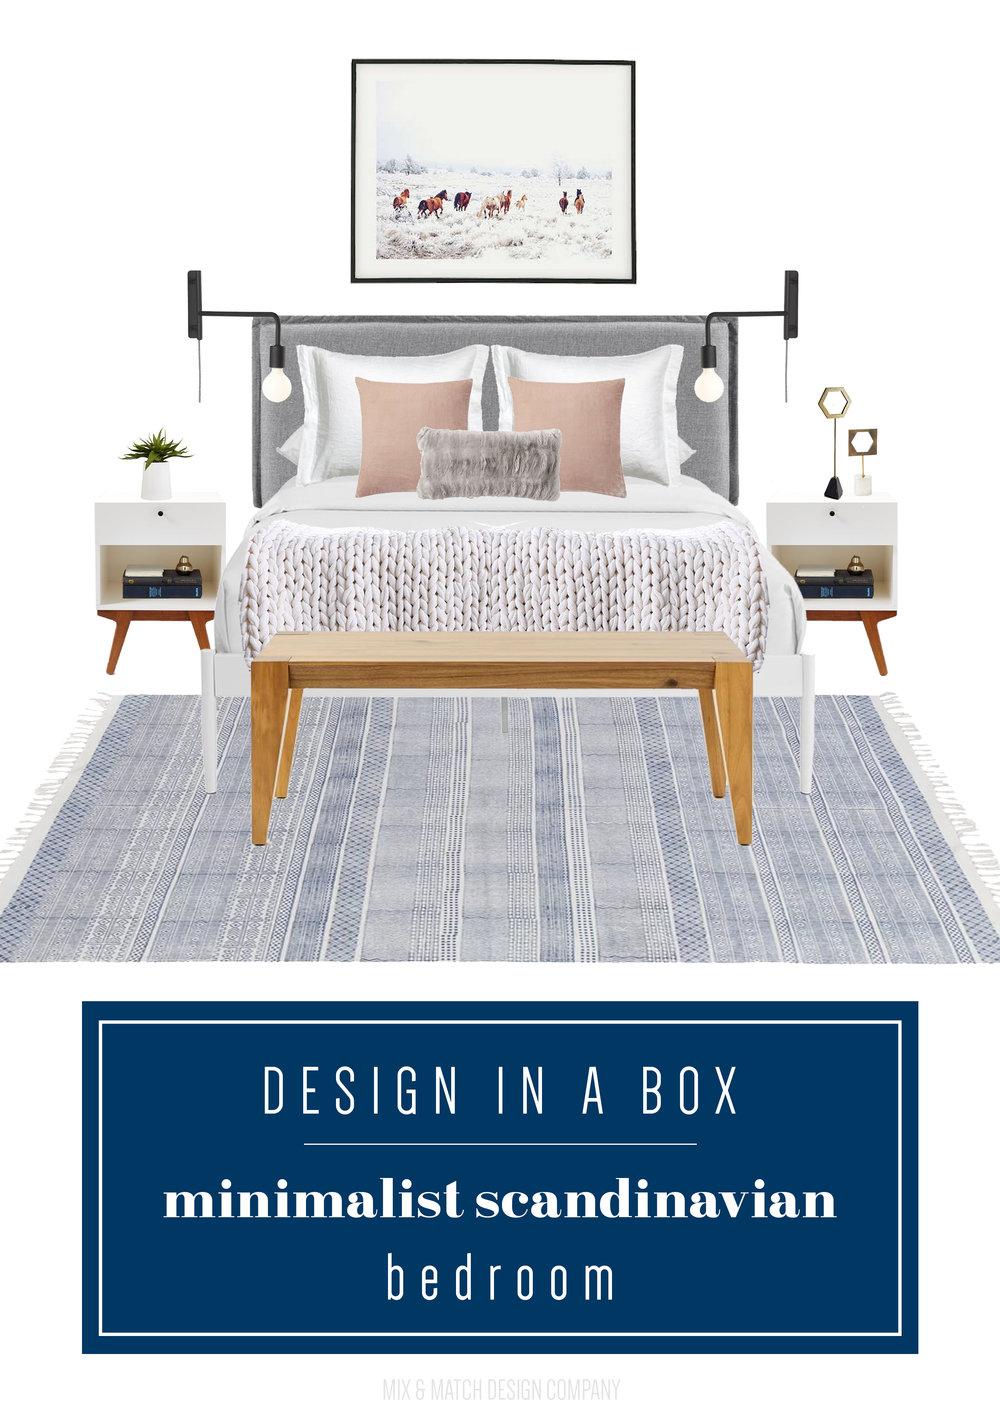 Minimalist-Scandinavian-Bedroom-DIAB.jpg